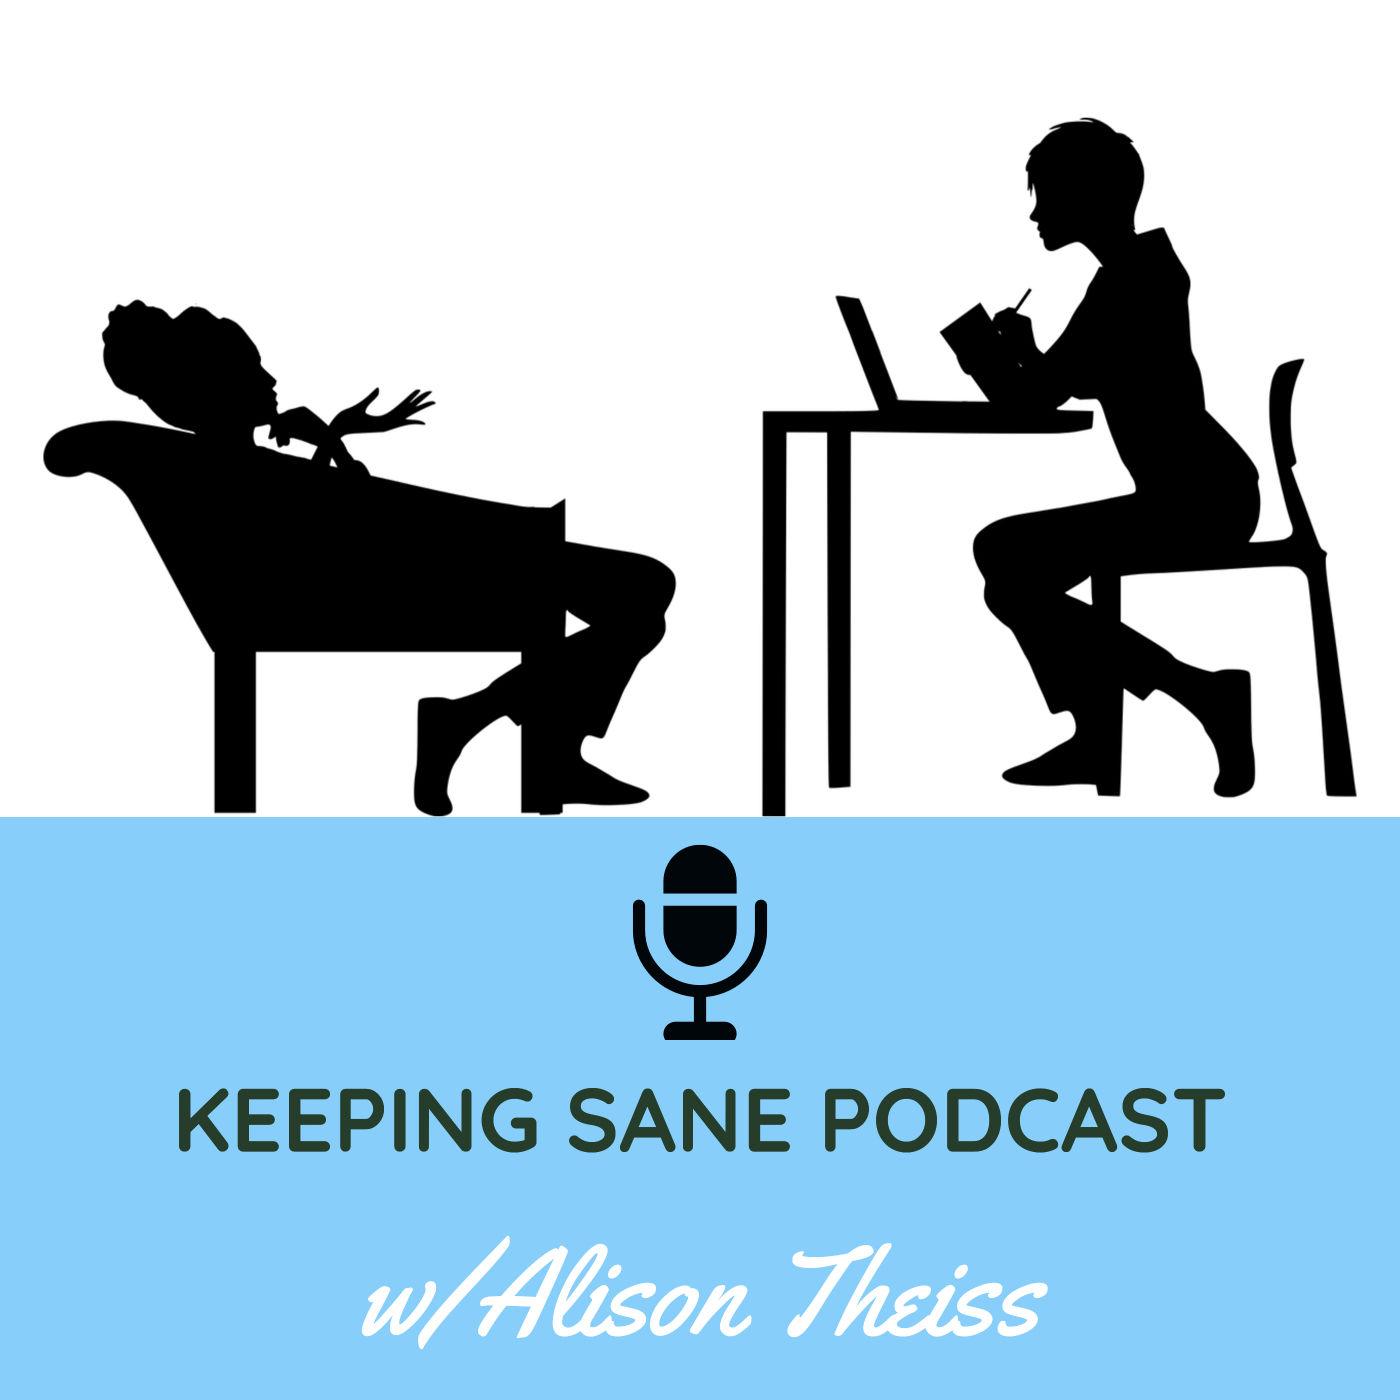 Keeping Sane Podcast